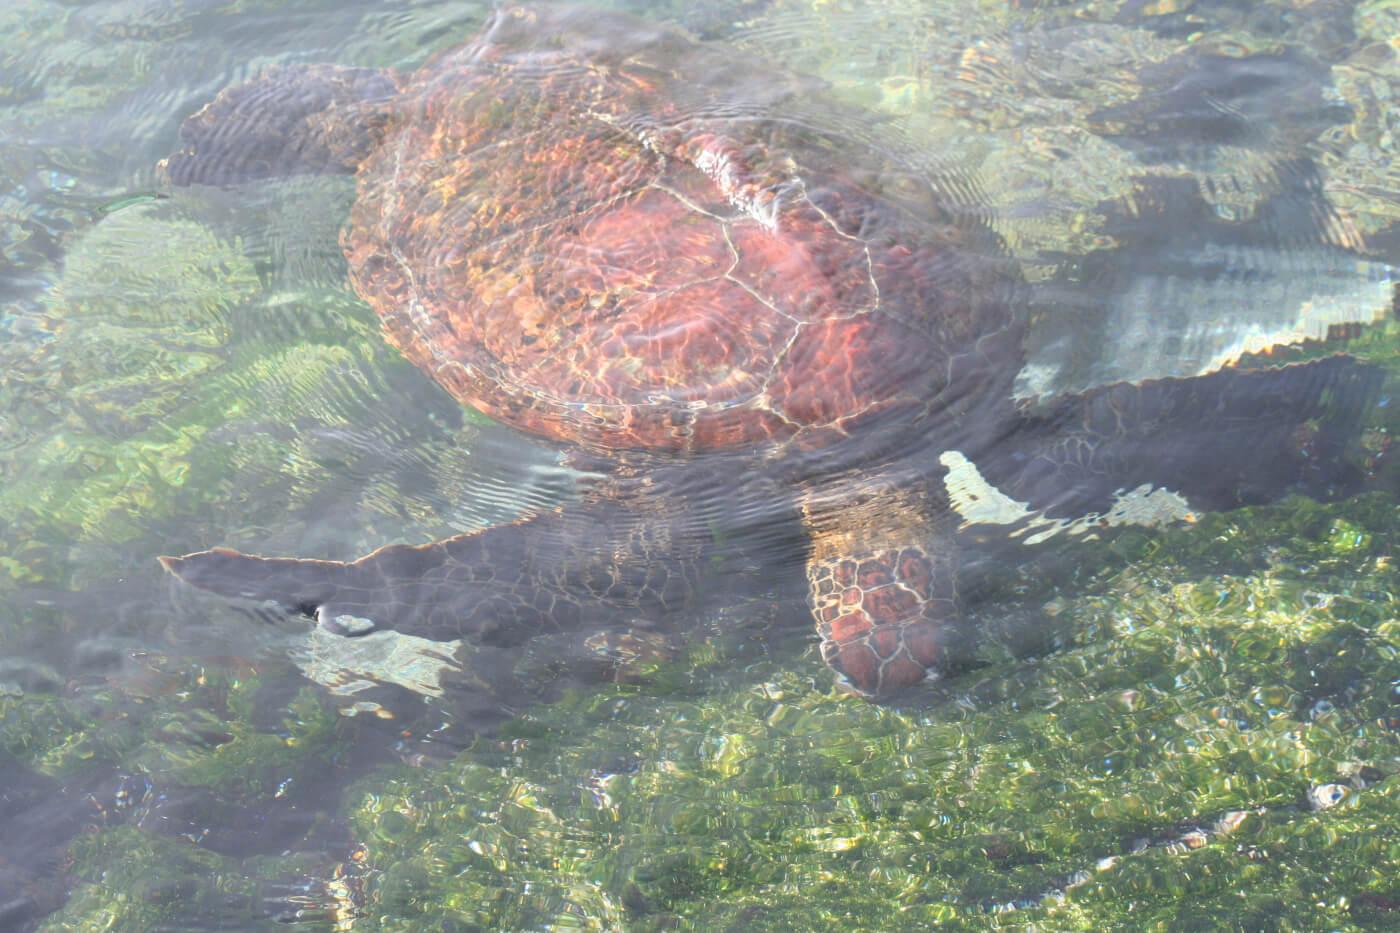 Chelonia mydas agassisi (Galapagos Green Turtle), Fernandina Island, Galapagos. Photo: Andreas Kelager, CDF.